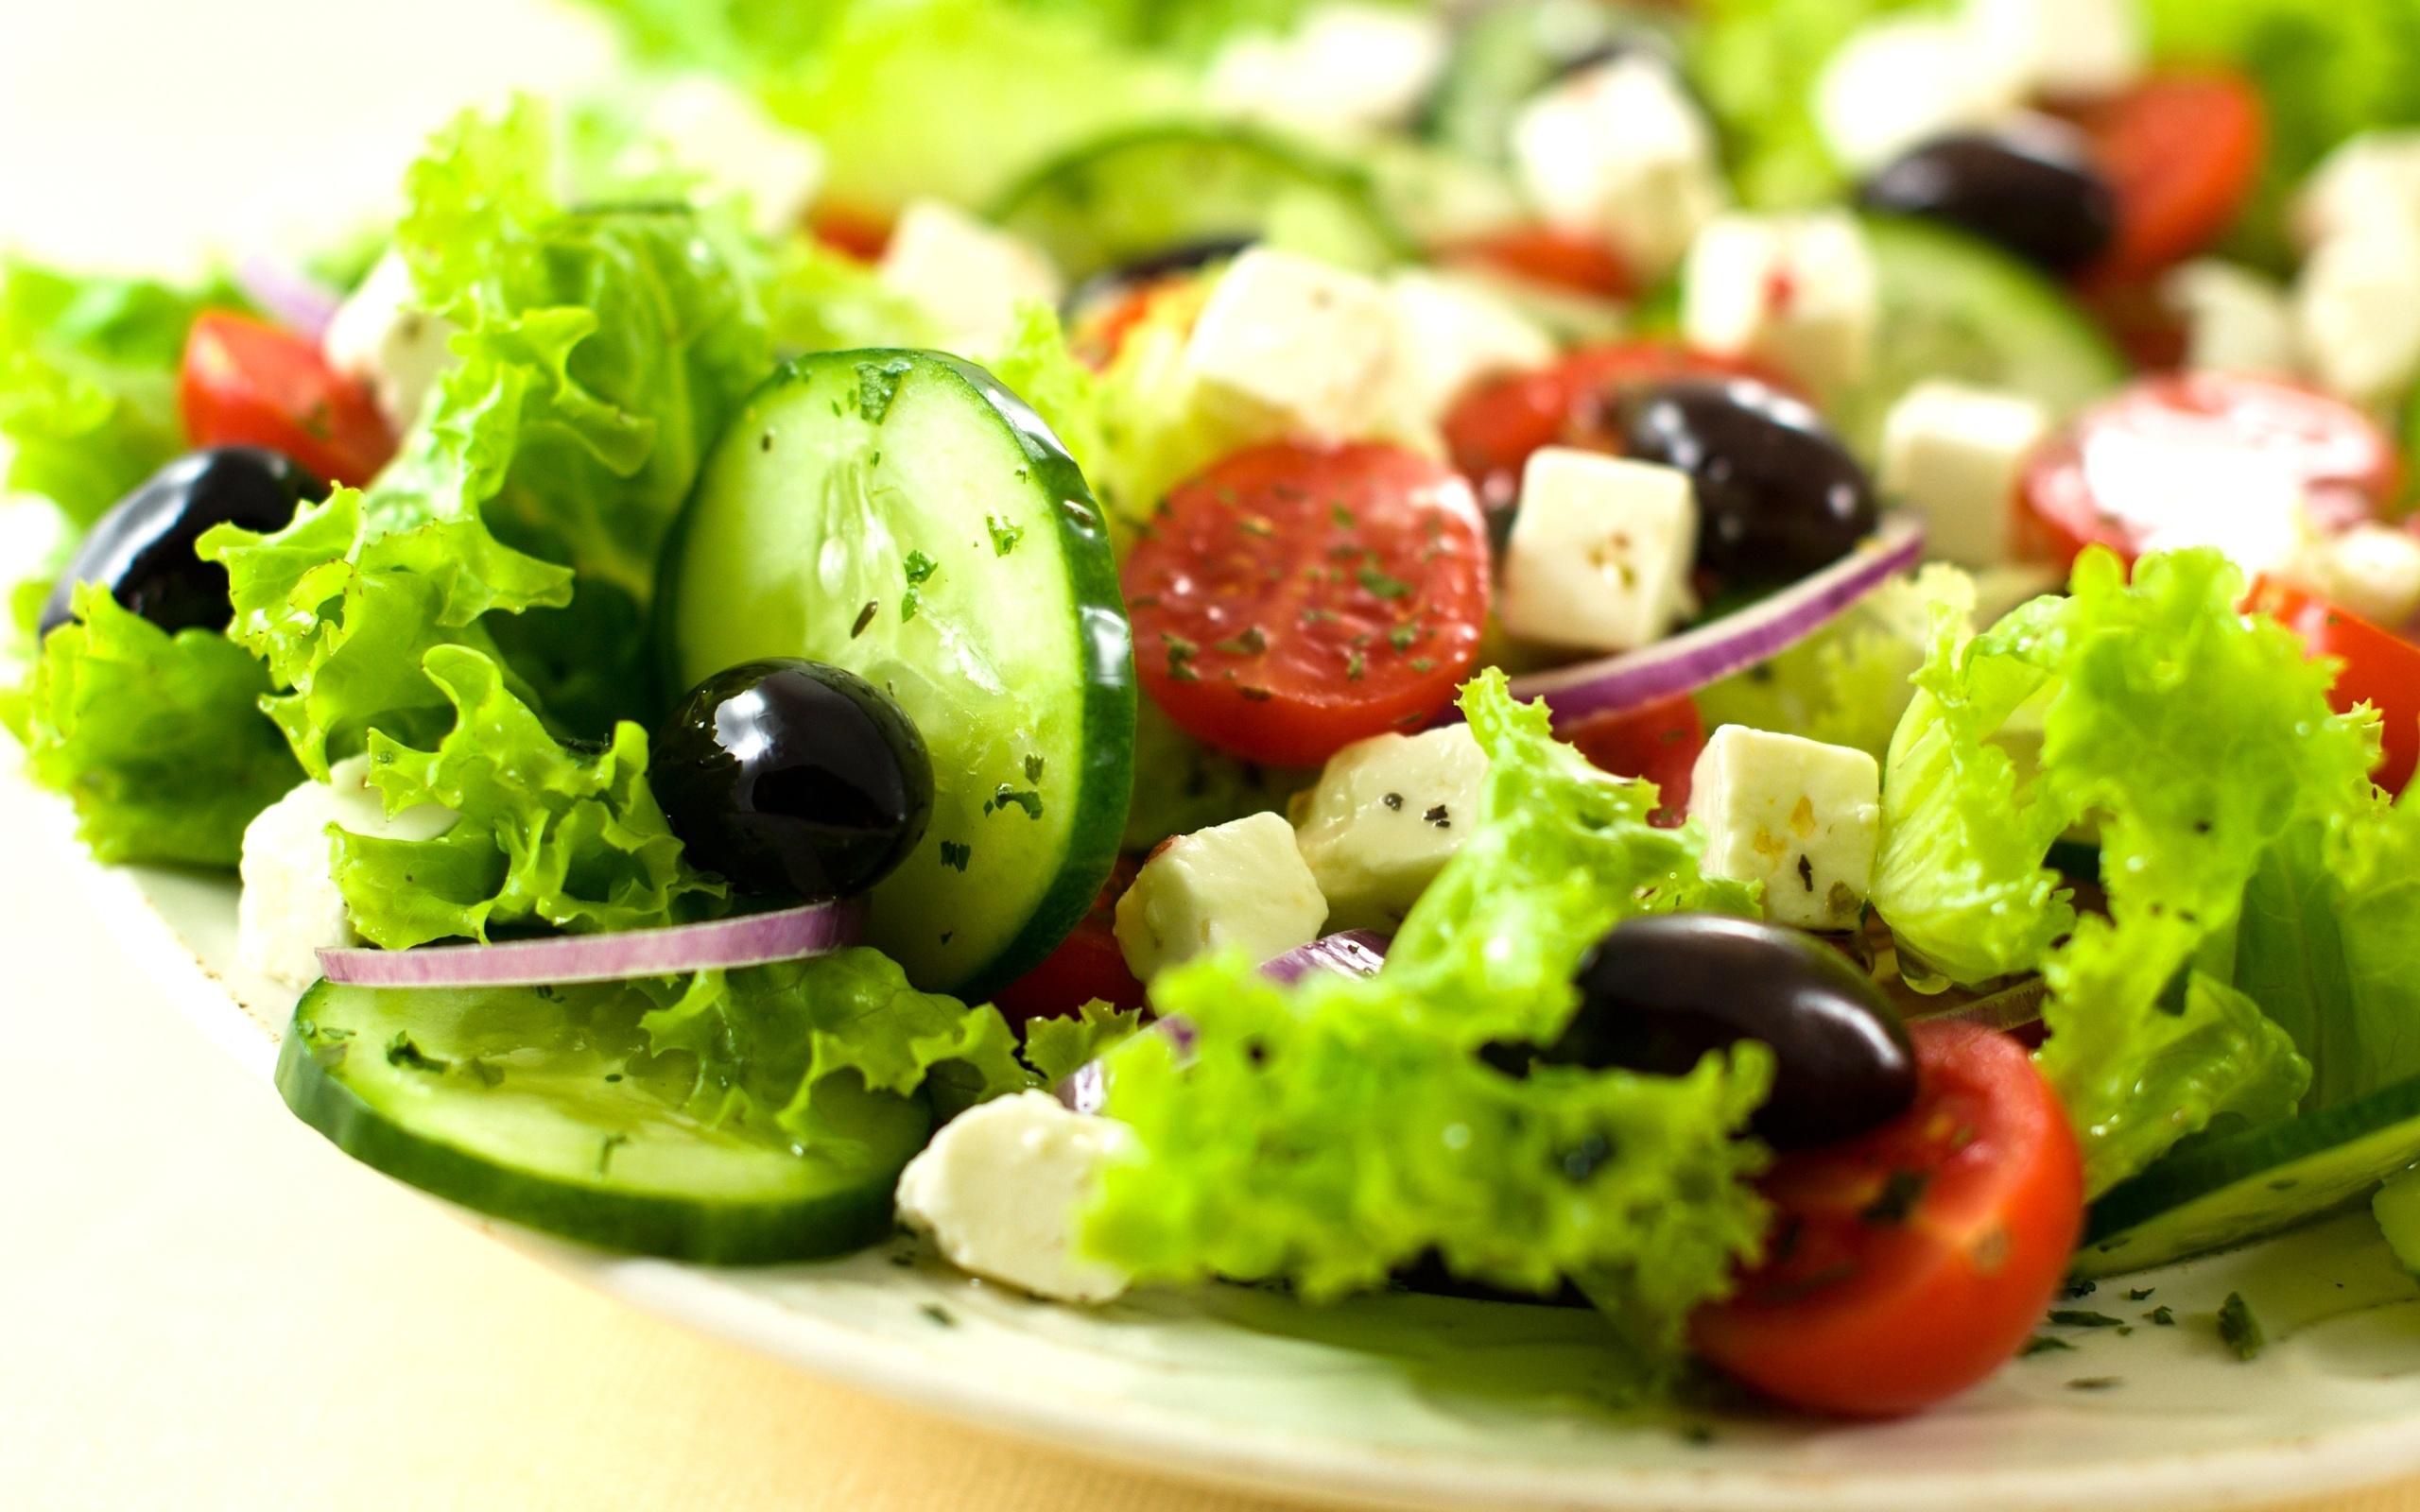 Cool Salad Wallpaper 42146 2560x1600 px